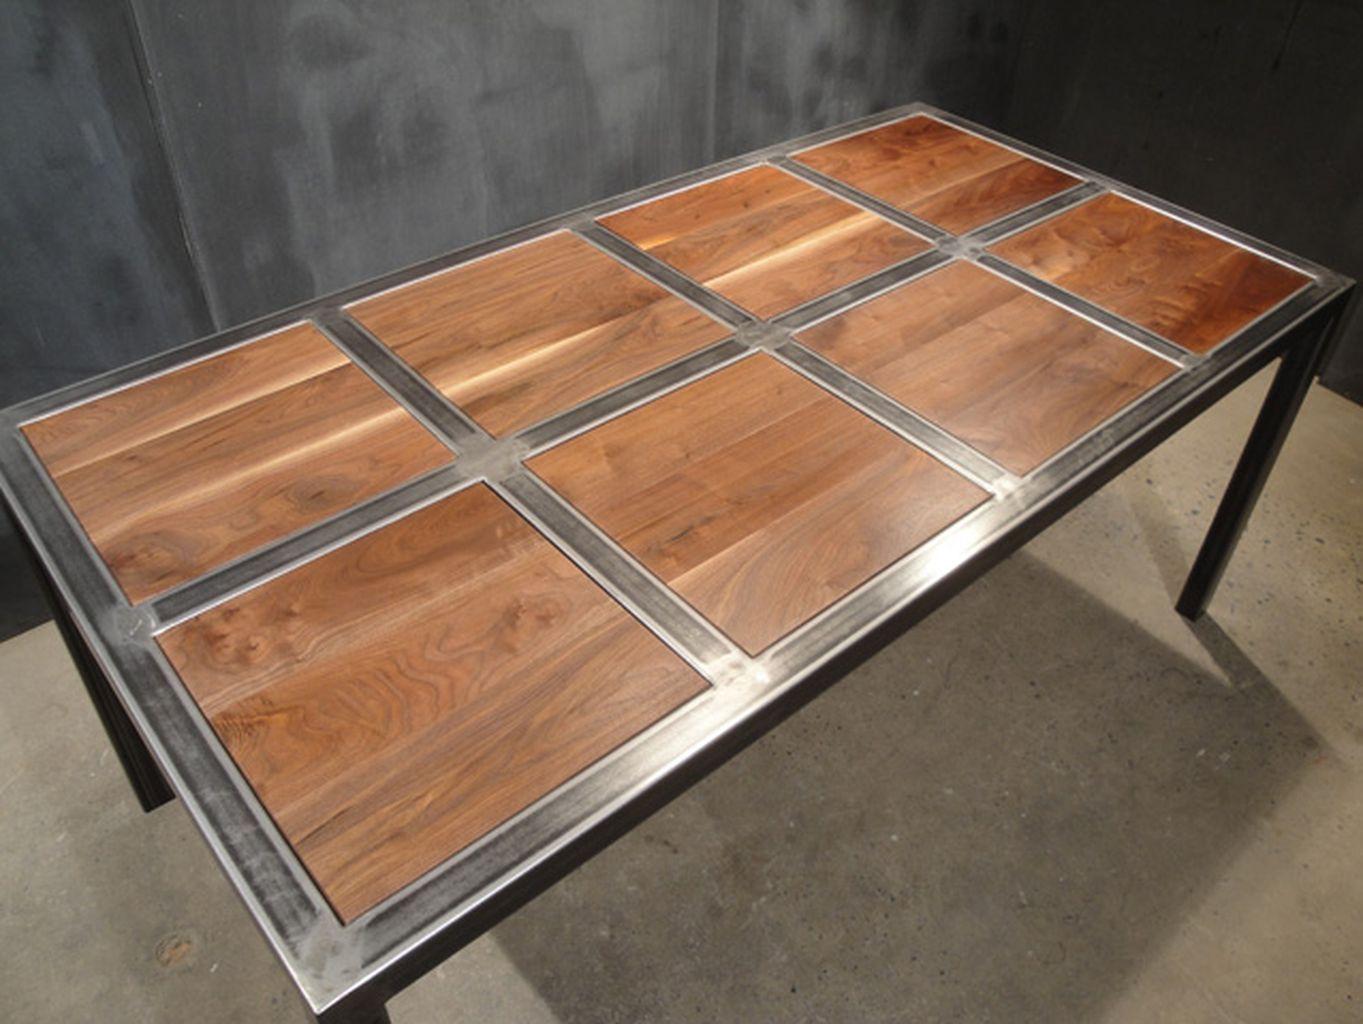 60 vintage wood industrial furniture design ideas for Bett industriedesign